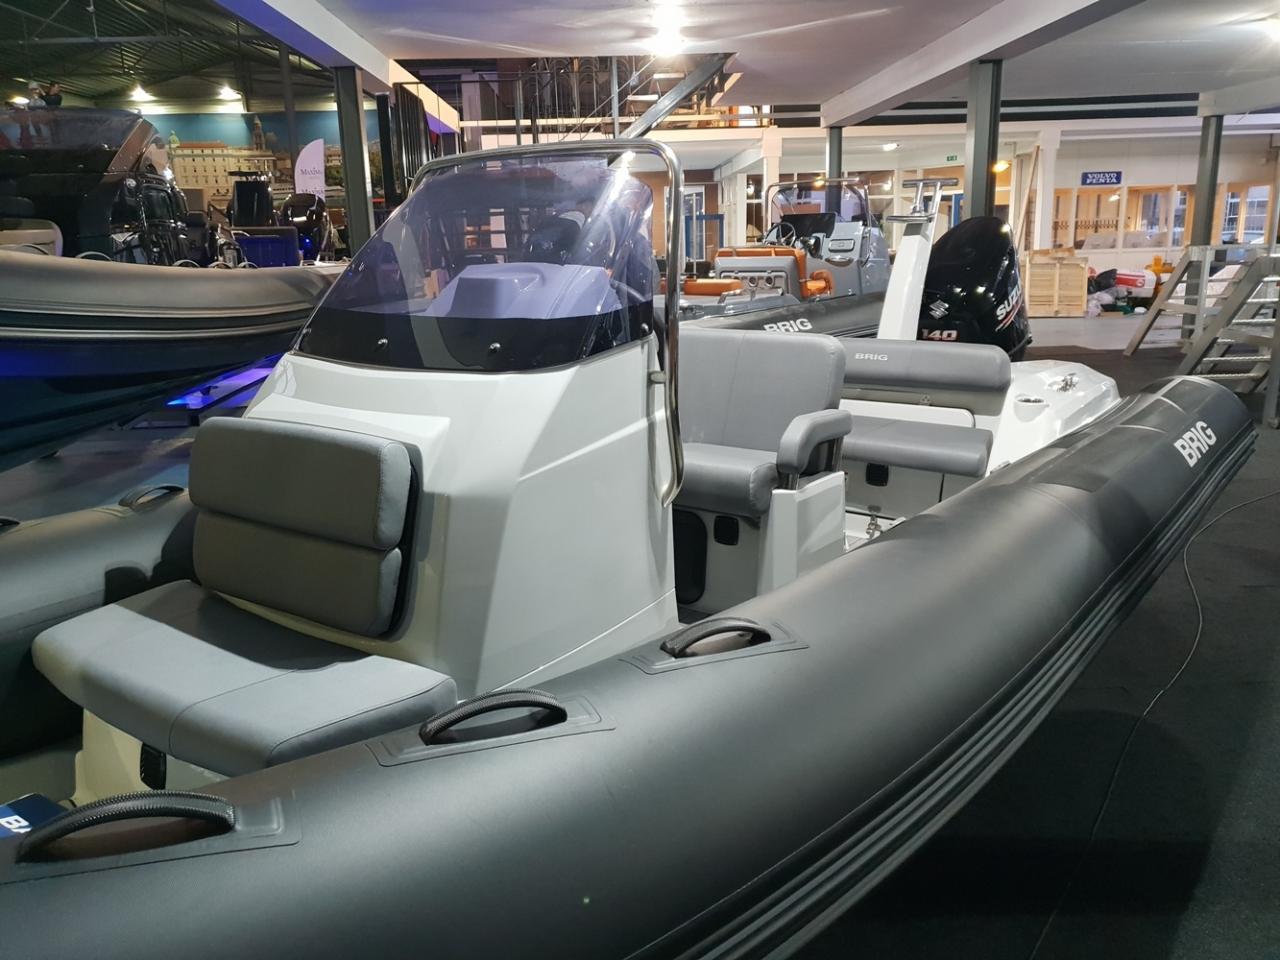 Brig Eagle 6 met Suzuki 140 pk 2